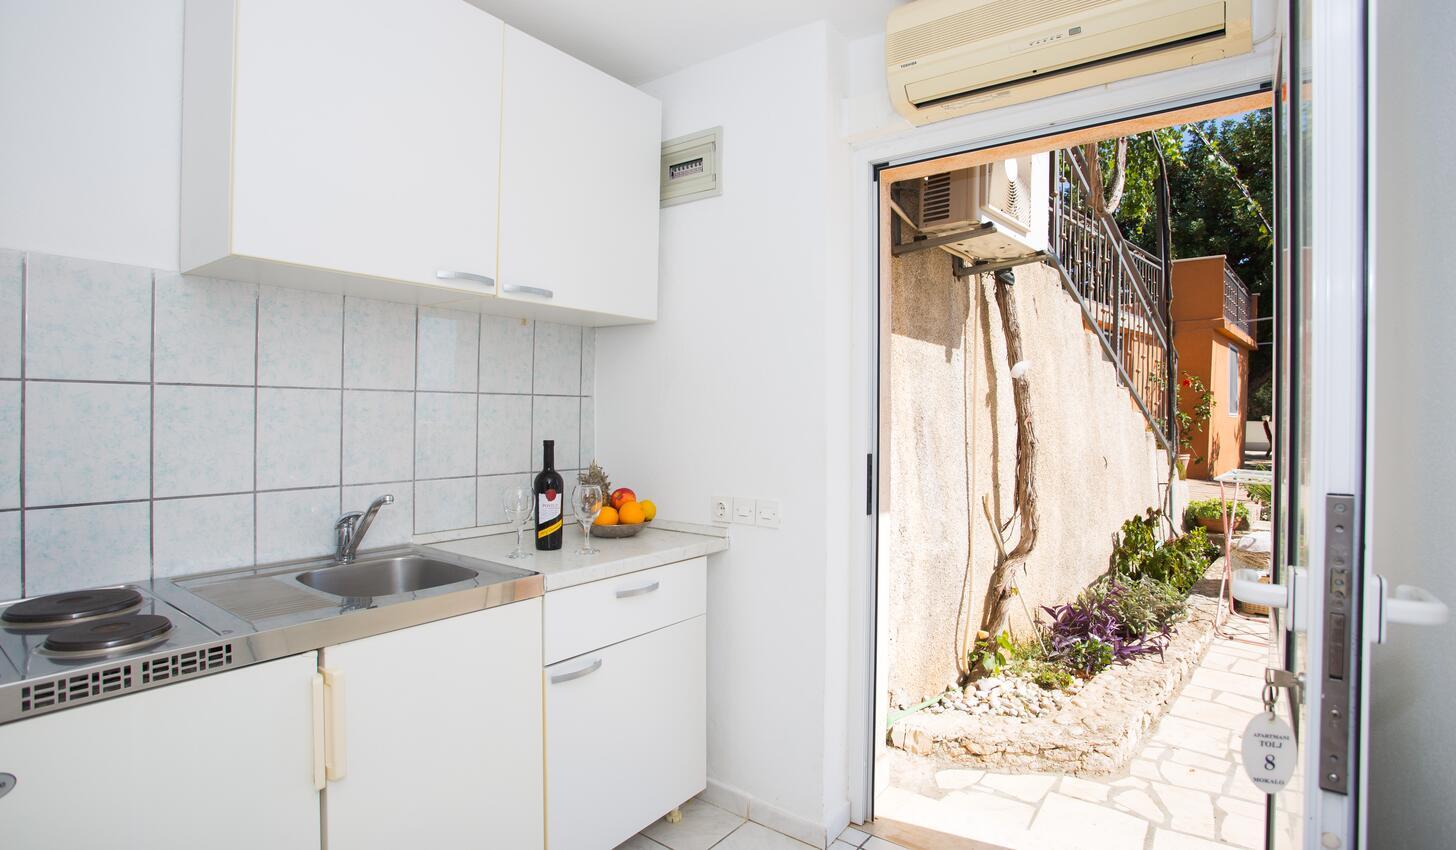 Ferienwohnung Studio Appartment im Ort Mokalo (Peljeaac), Kapazität 2+1 (1012792), Orebić, Insel Peljesac, Dalmatien, Kroatien, Bild 2